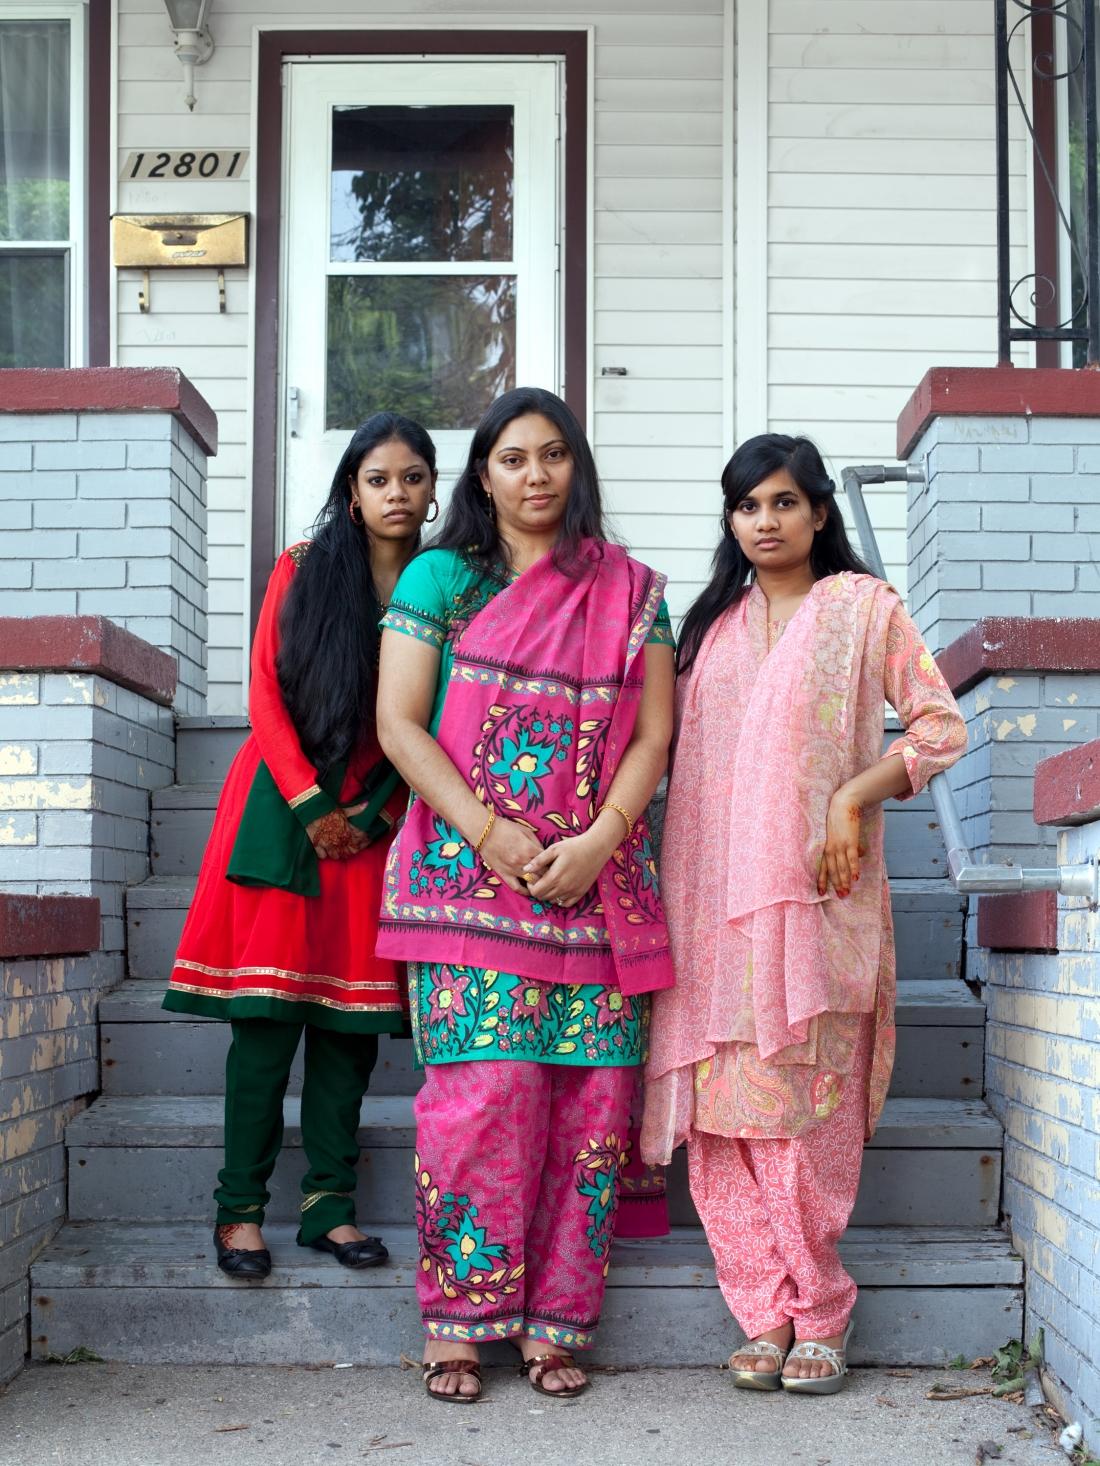 Munni, Aftar and Shahina, 2011. Courtesy of Corine Vermeulen